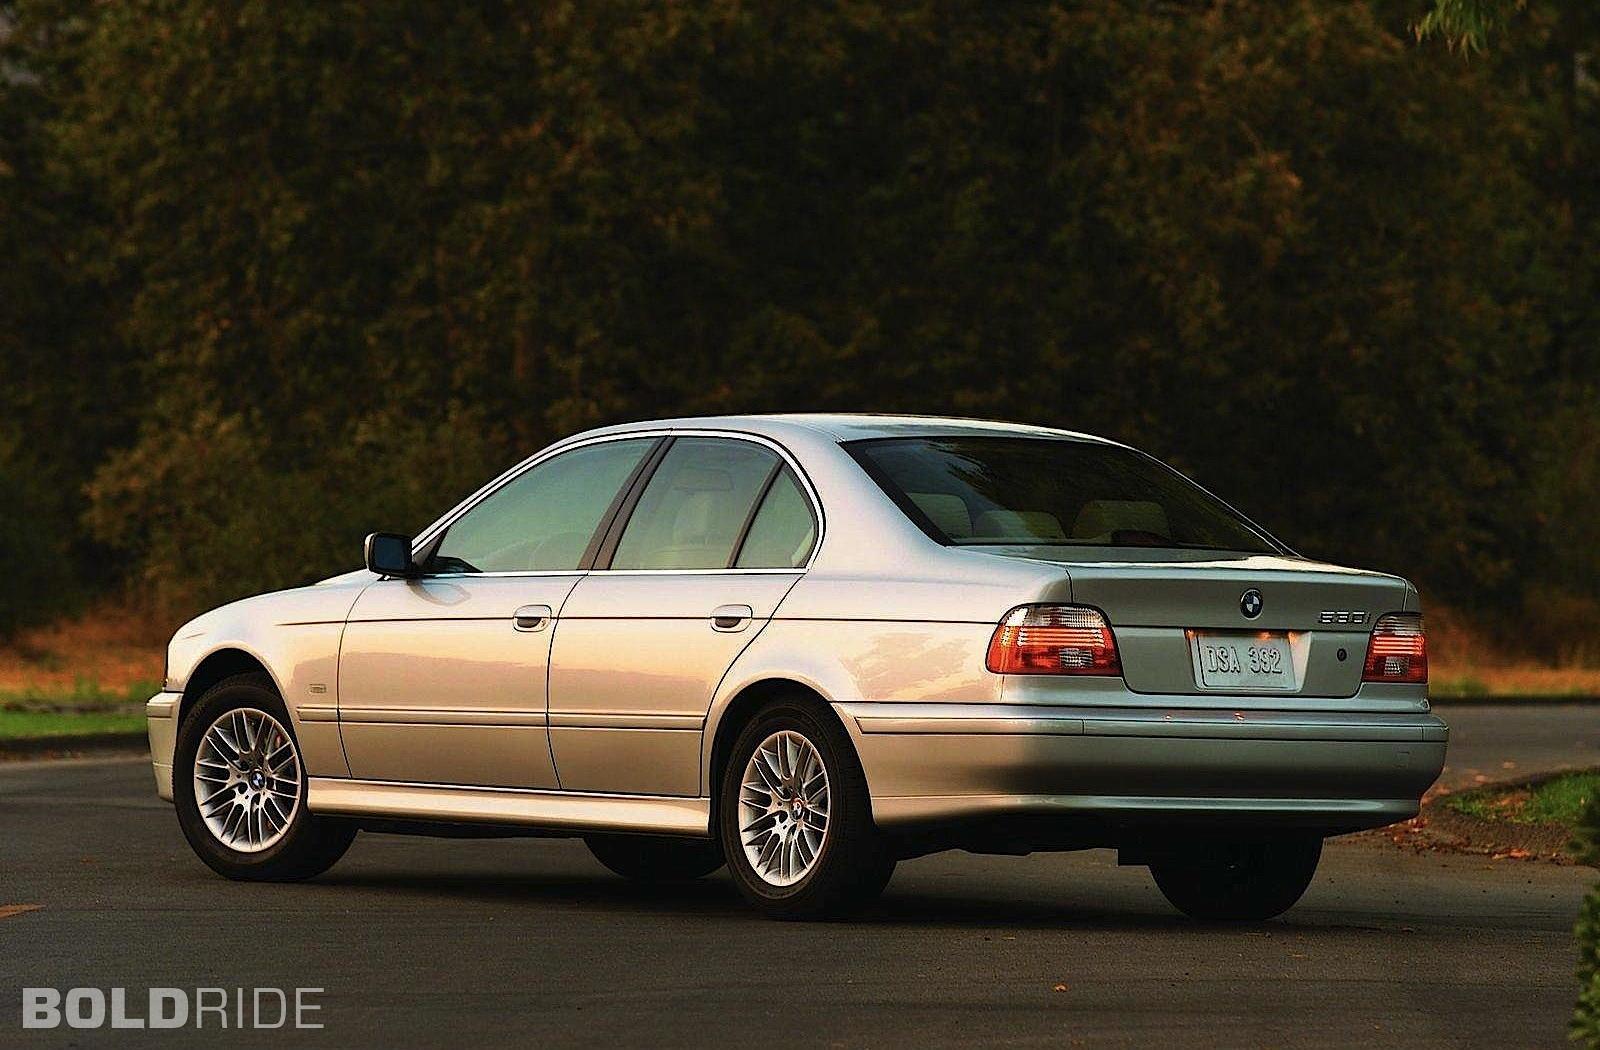 2001 BMW 525I >> 2001 BMW 5 Series - Information and photos - ZombieDrive